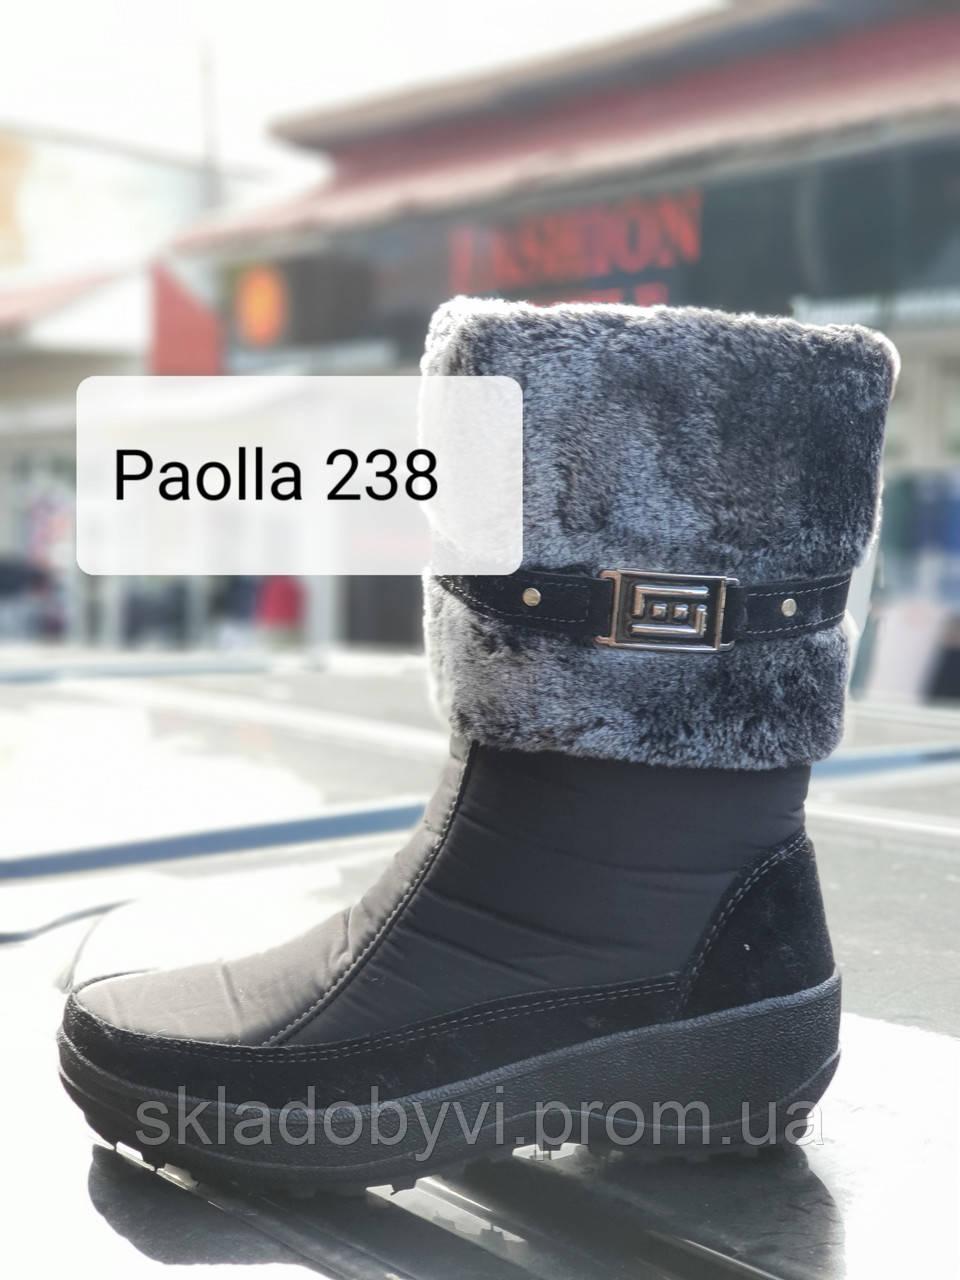 Сапоги(дутики) женскиезимние Paolla 238